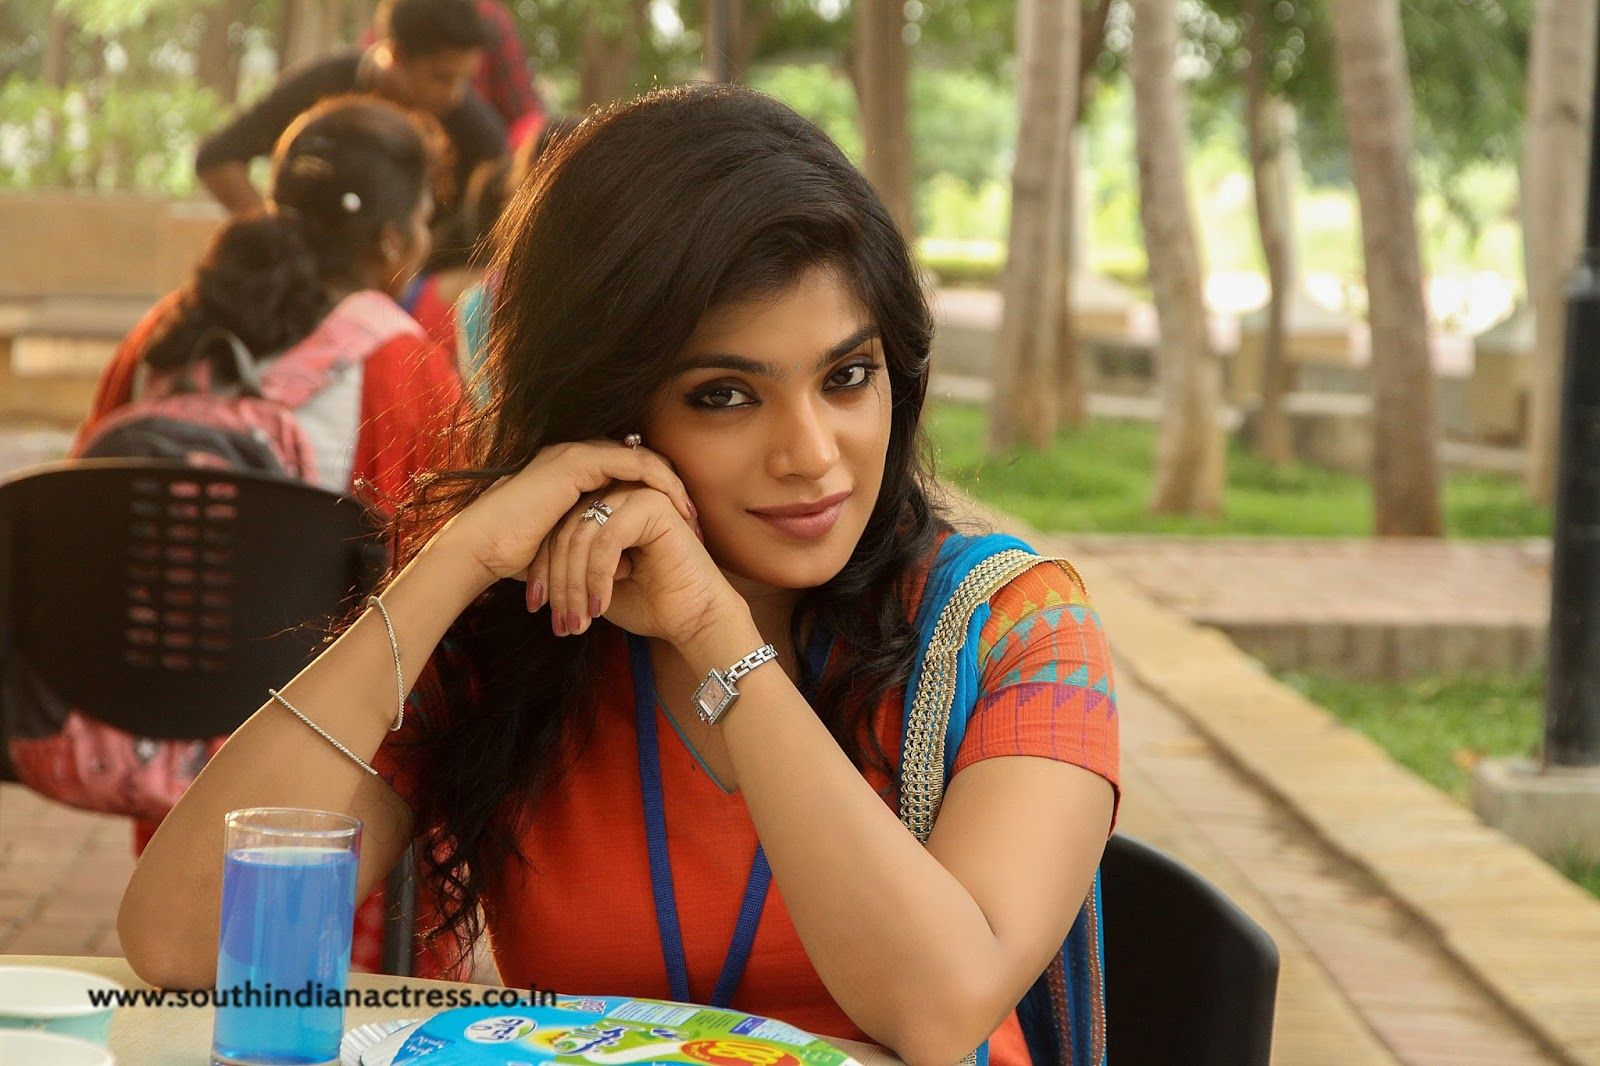 Aathmika in Meesaya Murukku Movie | Pinterest | Movie, Actresses and ...